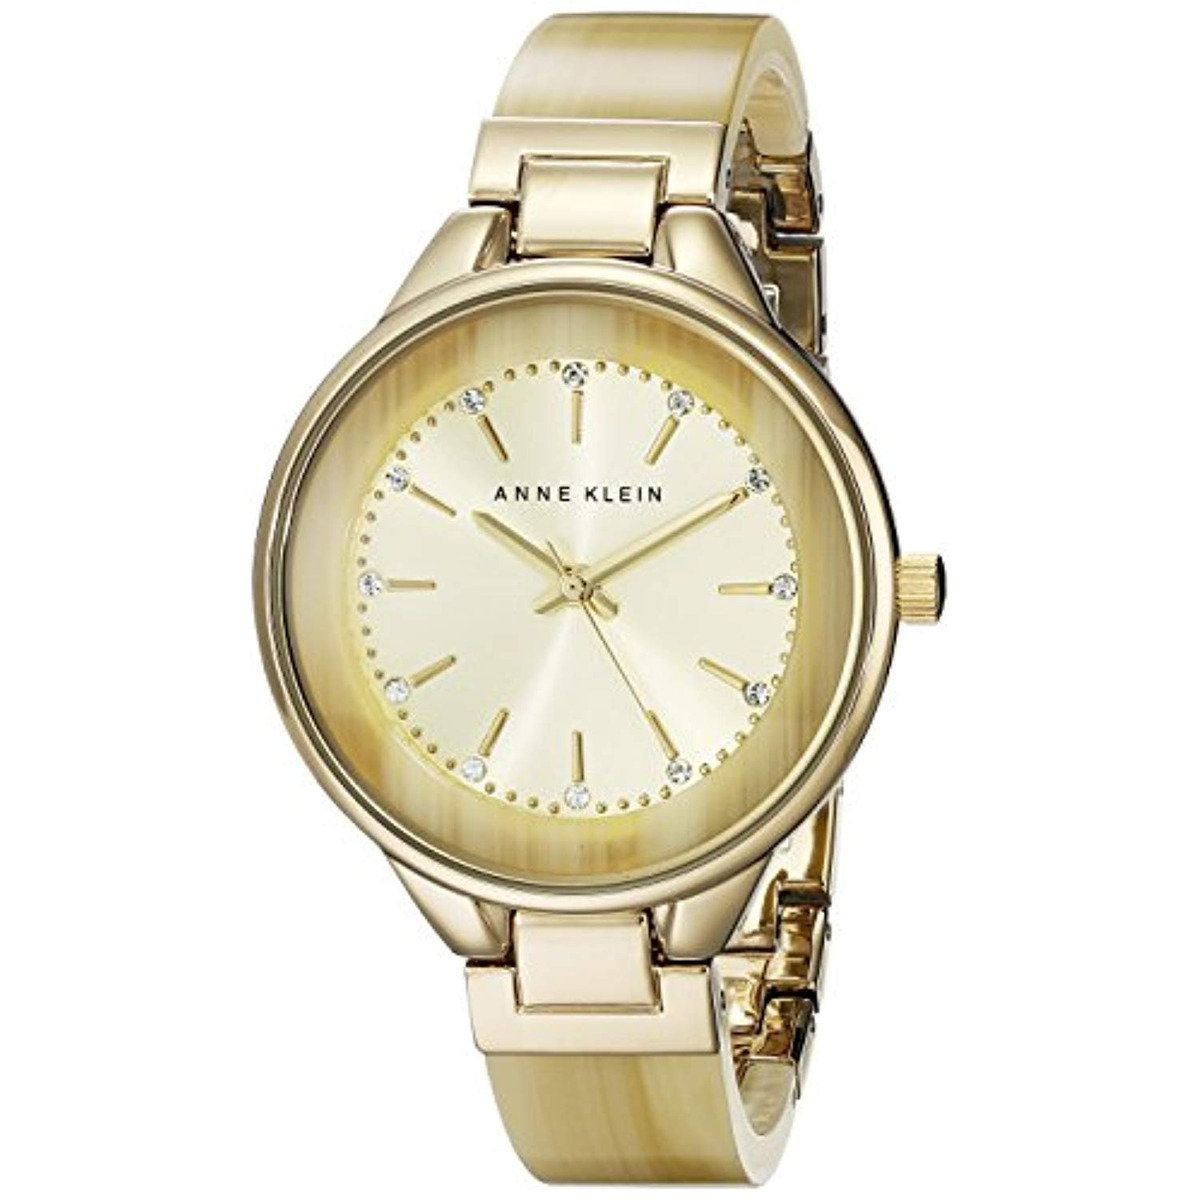 Reloj Mujer Swarovski Anne Ak 1408chhn Klein ymNwOv8n0